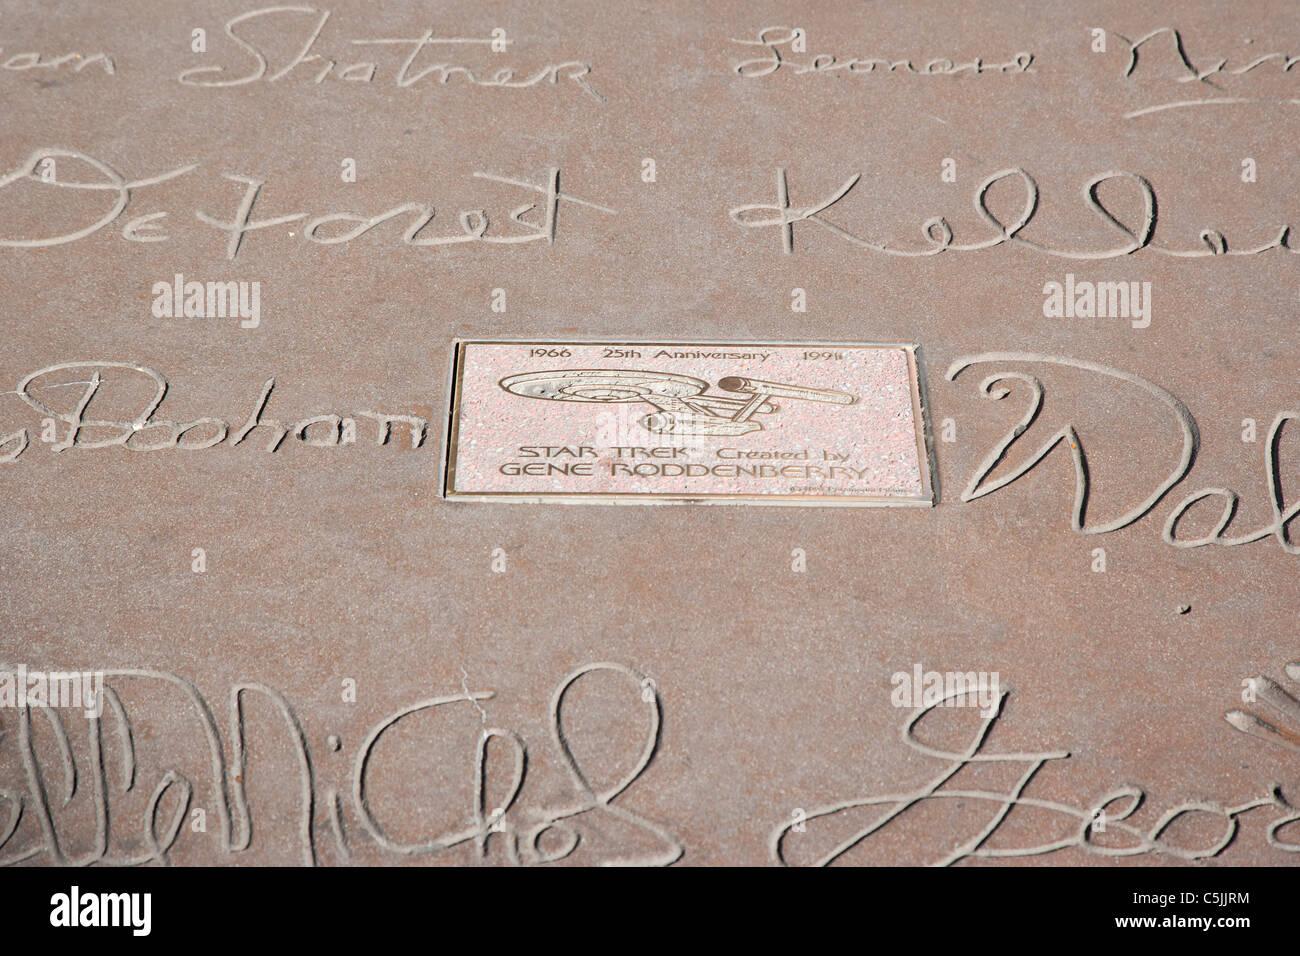 Star Trek stars main et pied imprime à Grauman's Chinese Theatre, à Hollywood, Los Angeles, Californie, Photo Stock